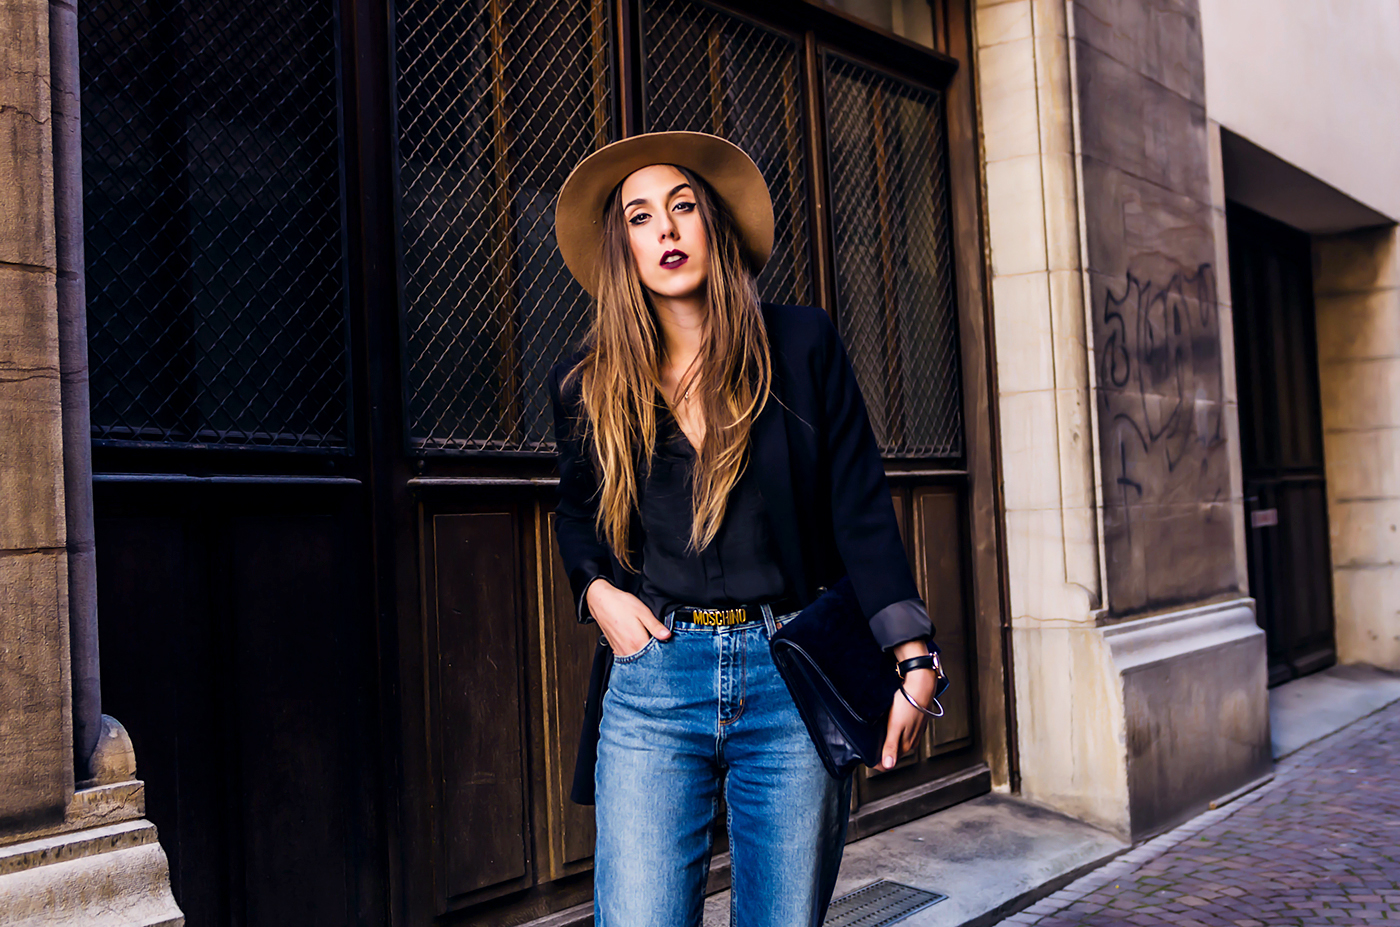 alison liaudat, swiss fashion blogger, blog mode suisee, Schweizer bloggerin, beauty blogger switzerland, moschino, sandro paris, hat, daniel wellington,